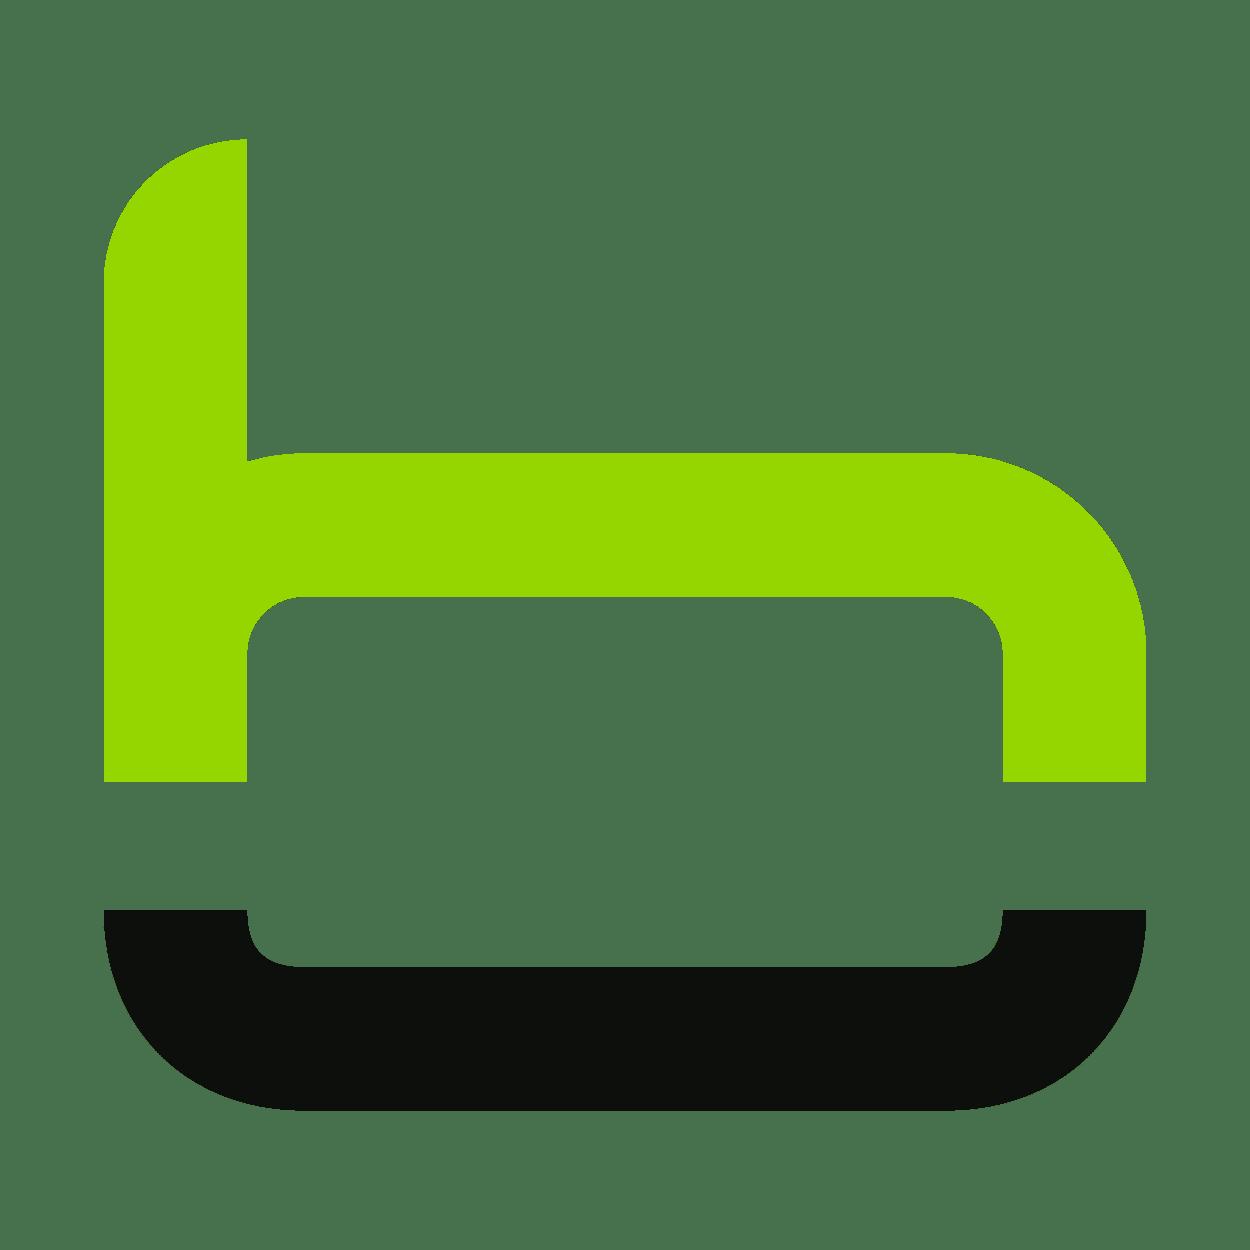 Blockhenge icon